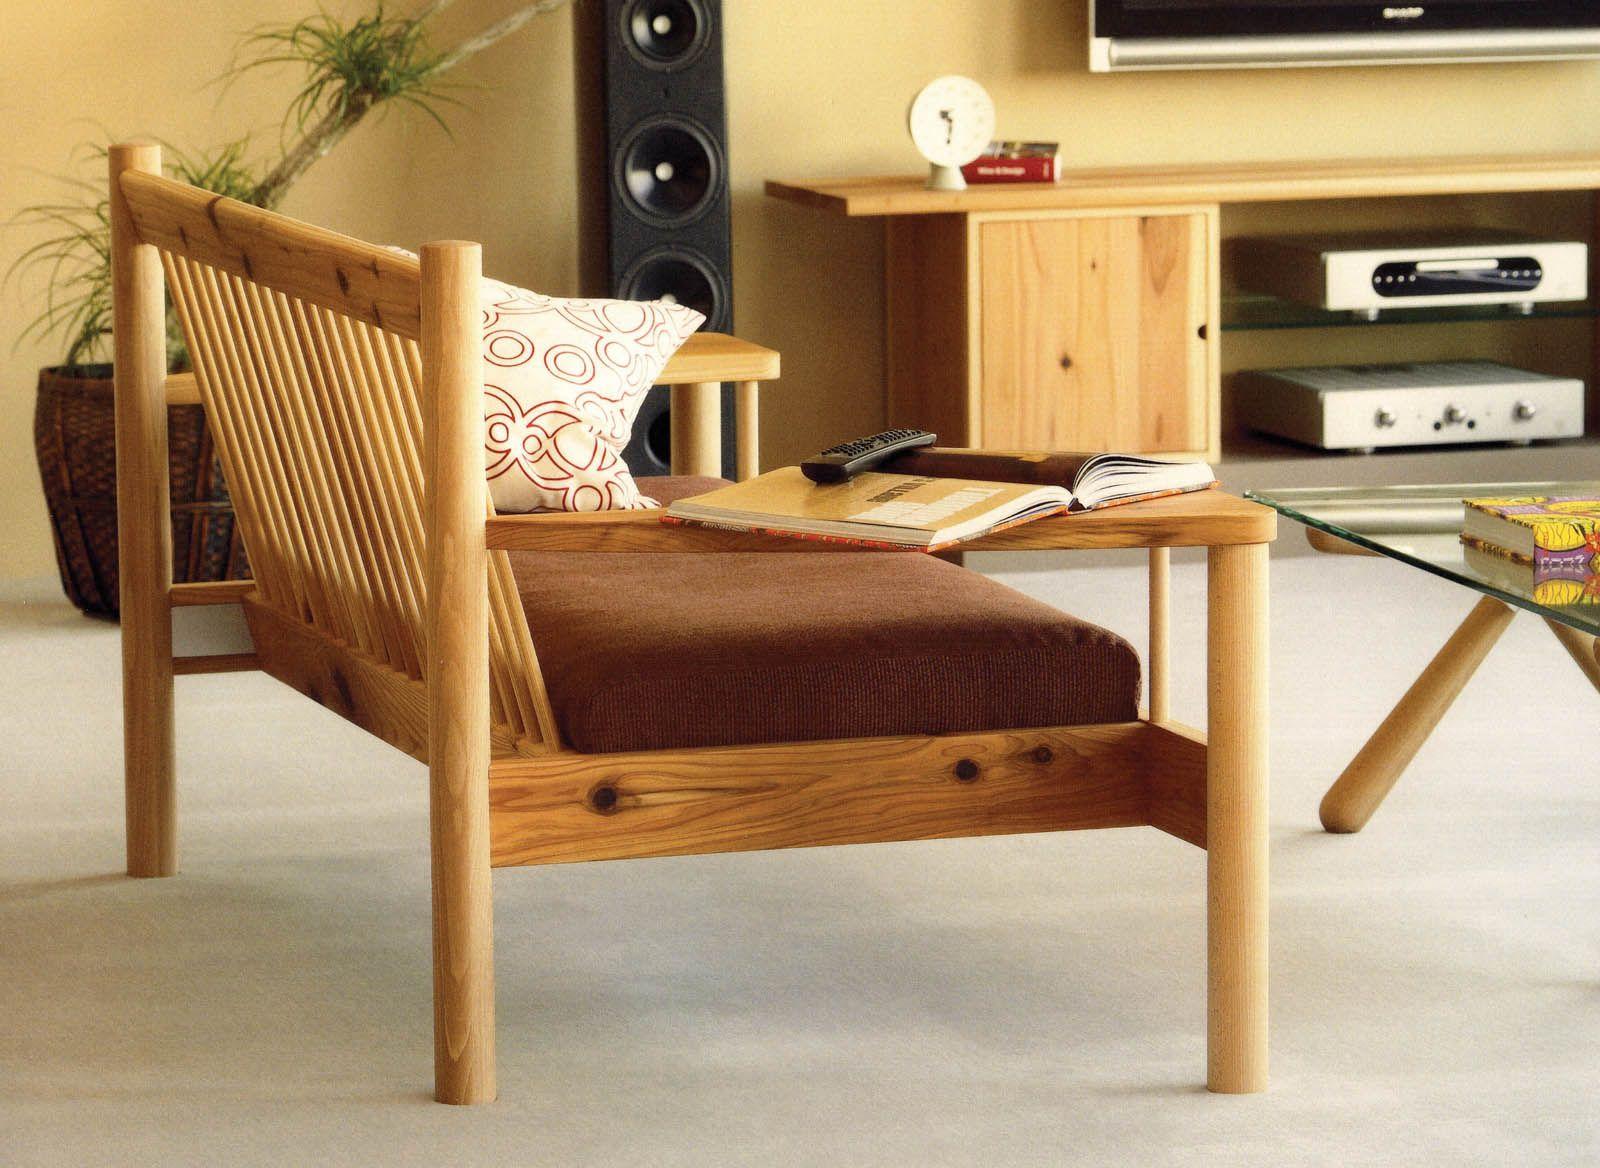 Japan's 'hidden treasure' forms furniture line Furniture